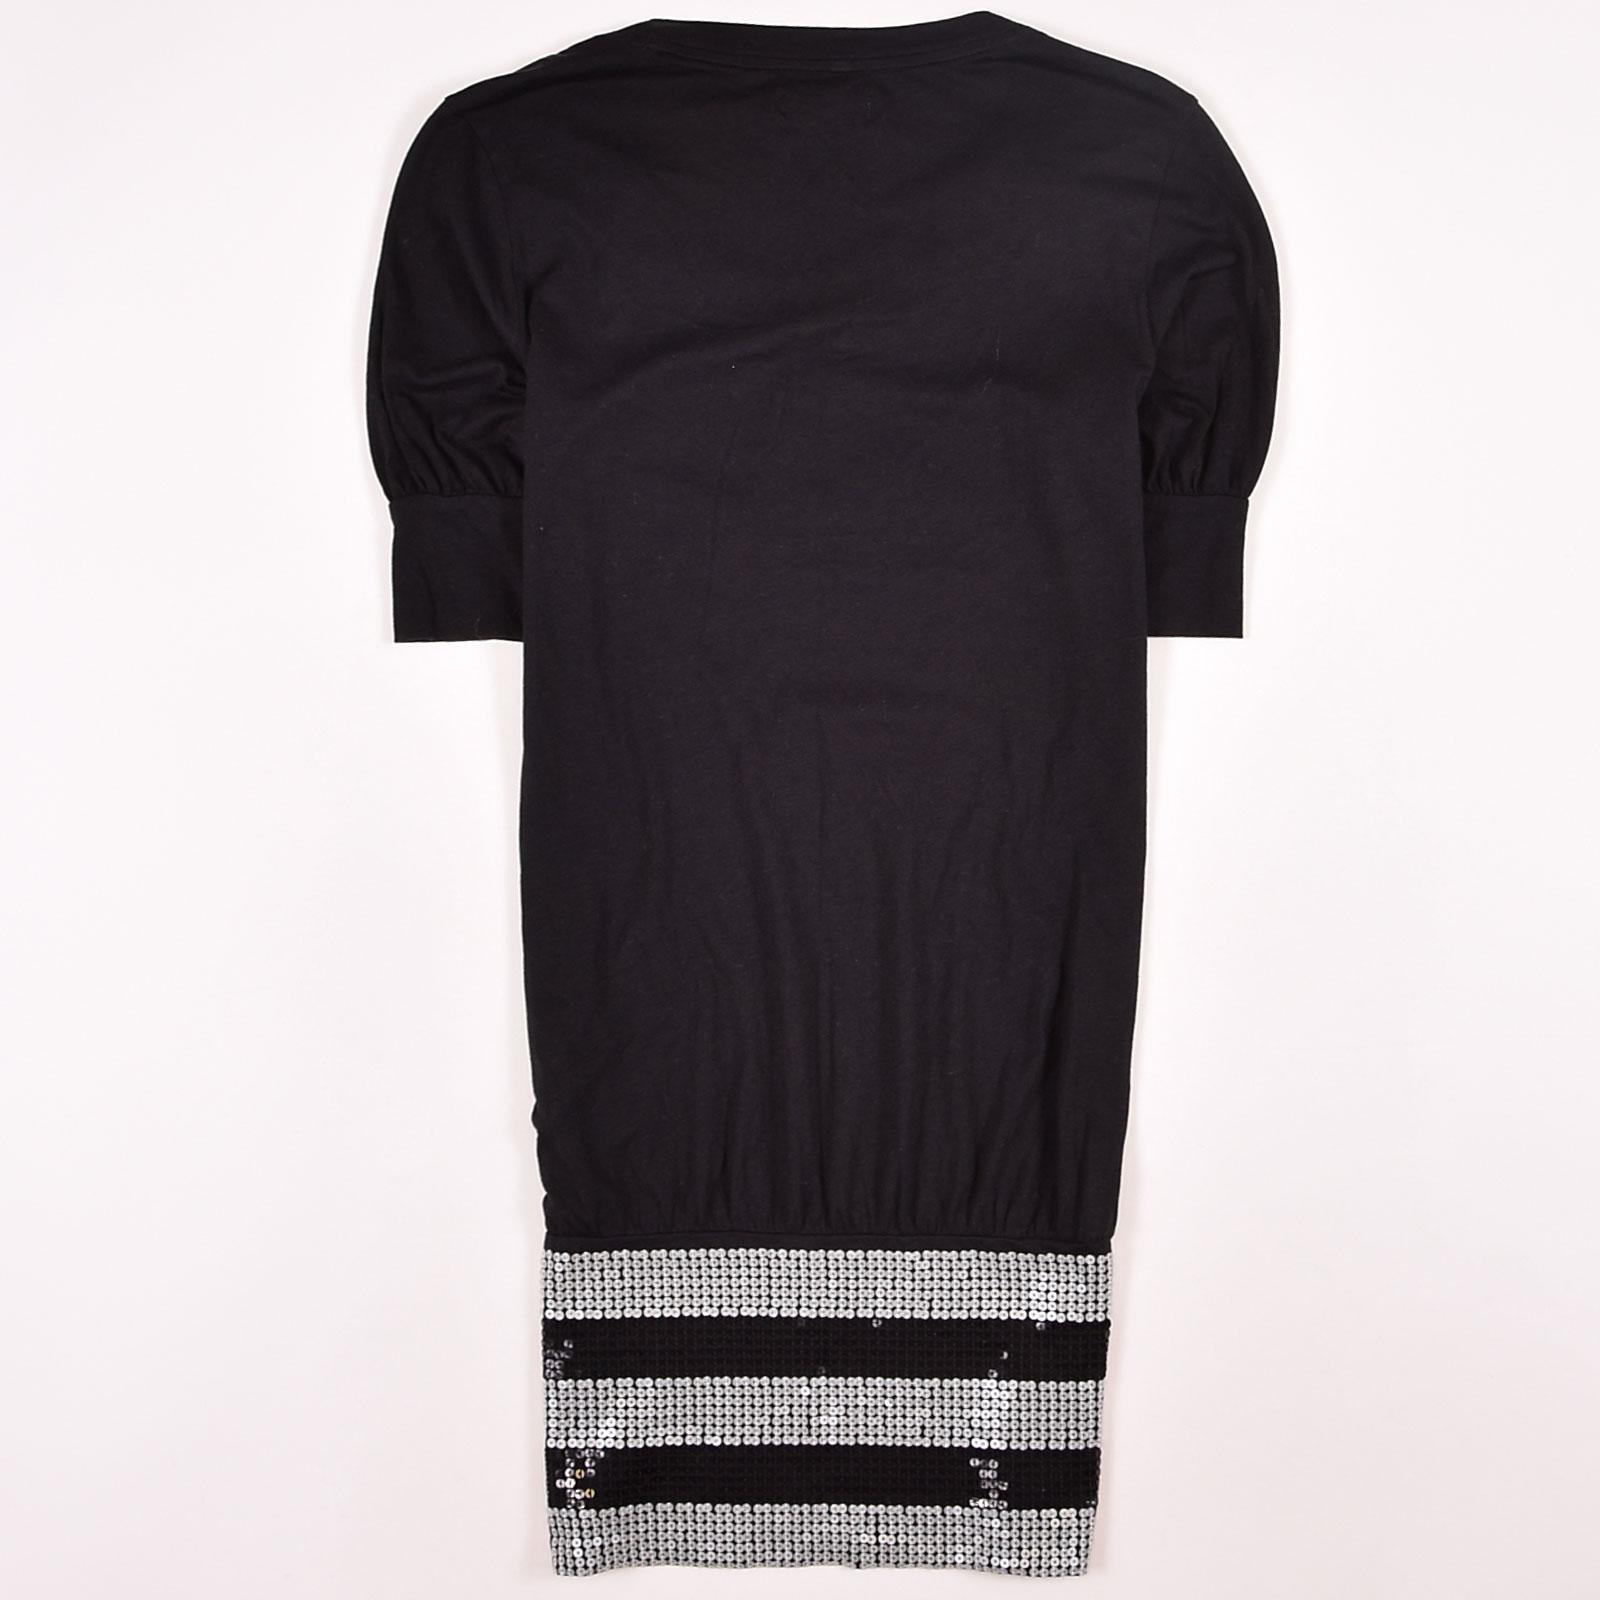 Adidas Damen Kleid Dress Gr.32 Schwarz 96167   eBay